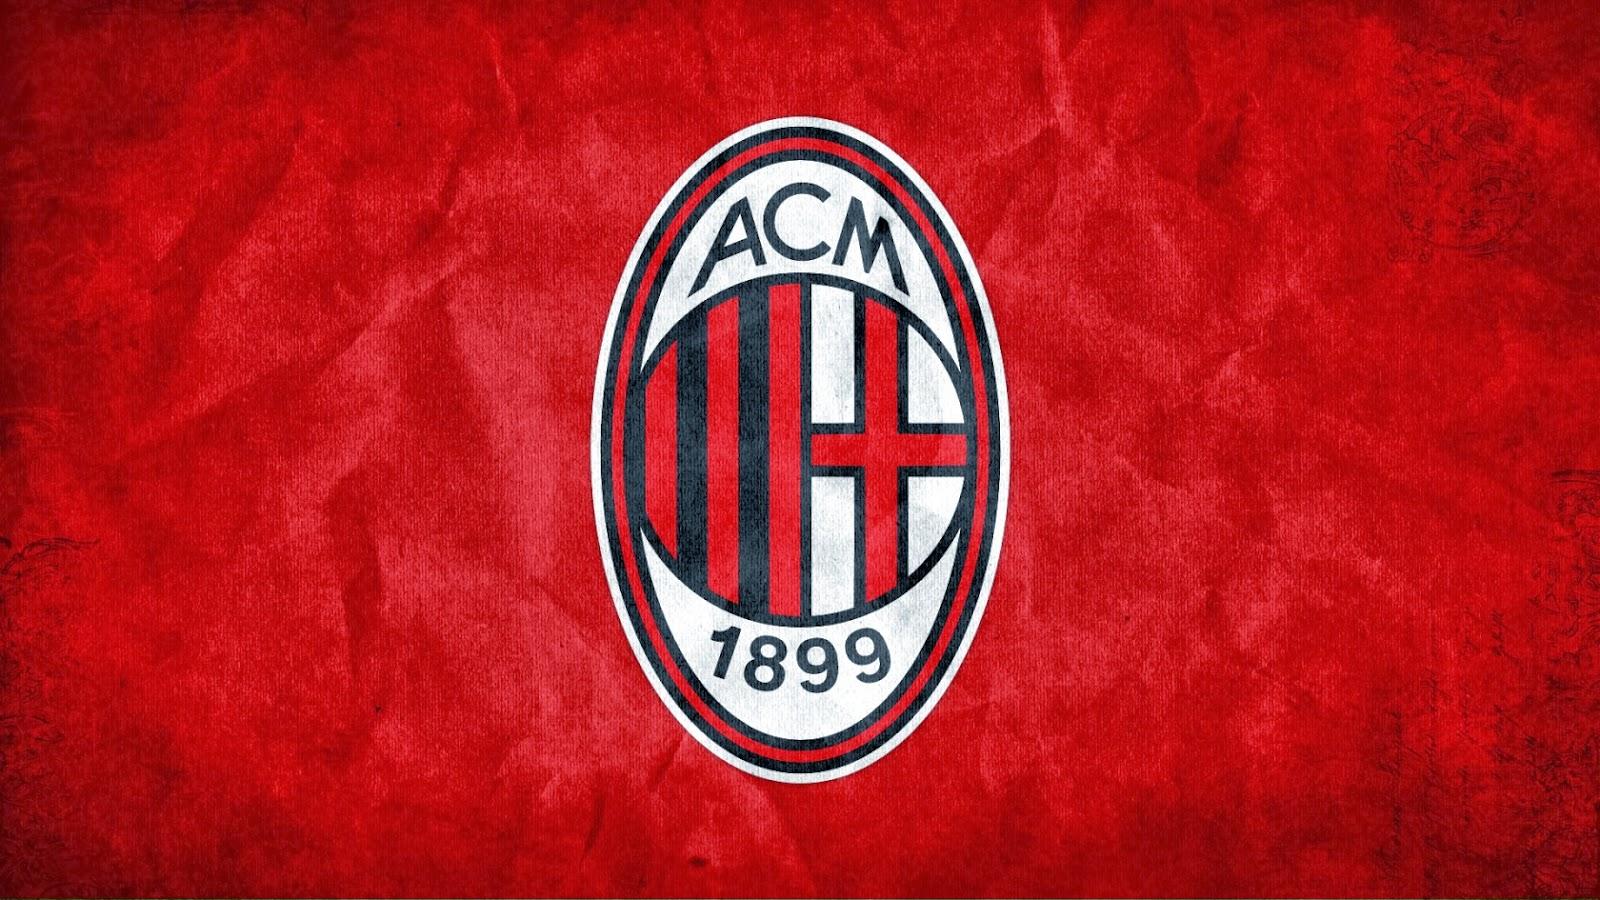 AC Milan FC Logo HD Wallpapers 2014 2015 1600x900